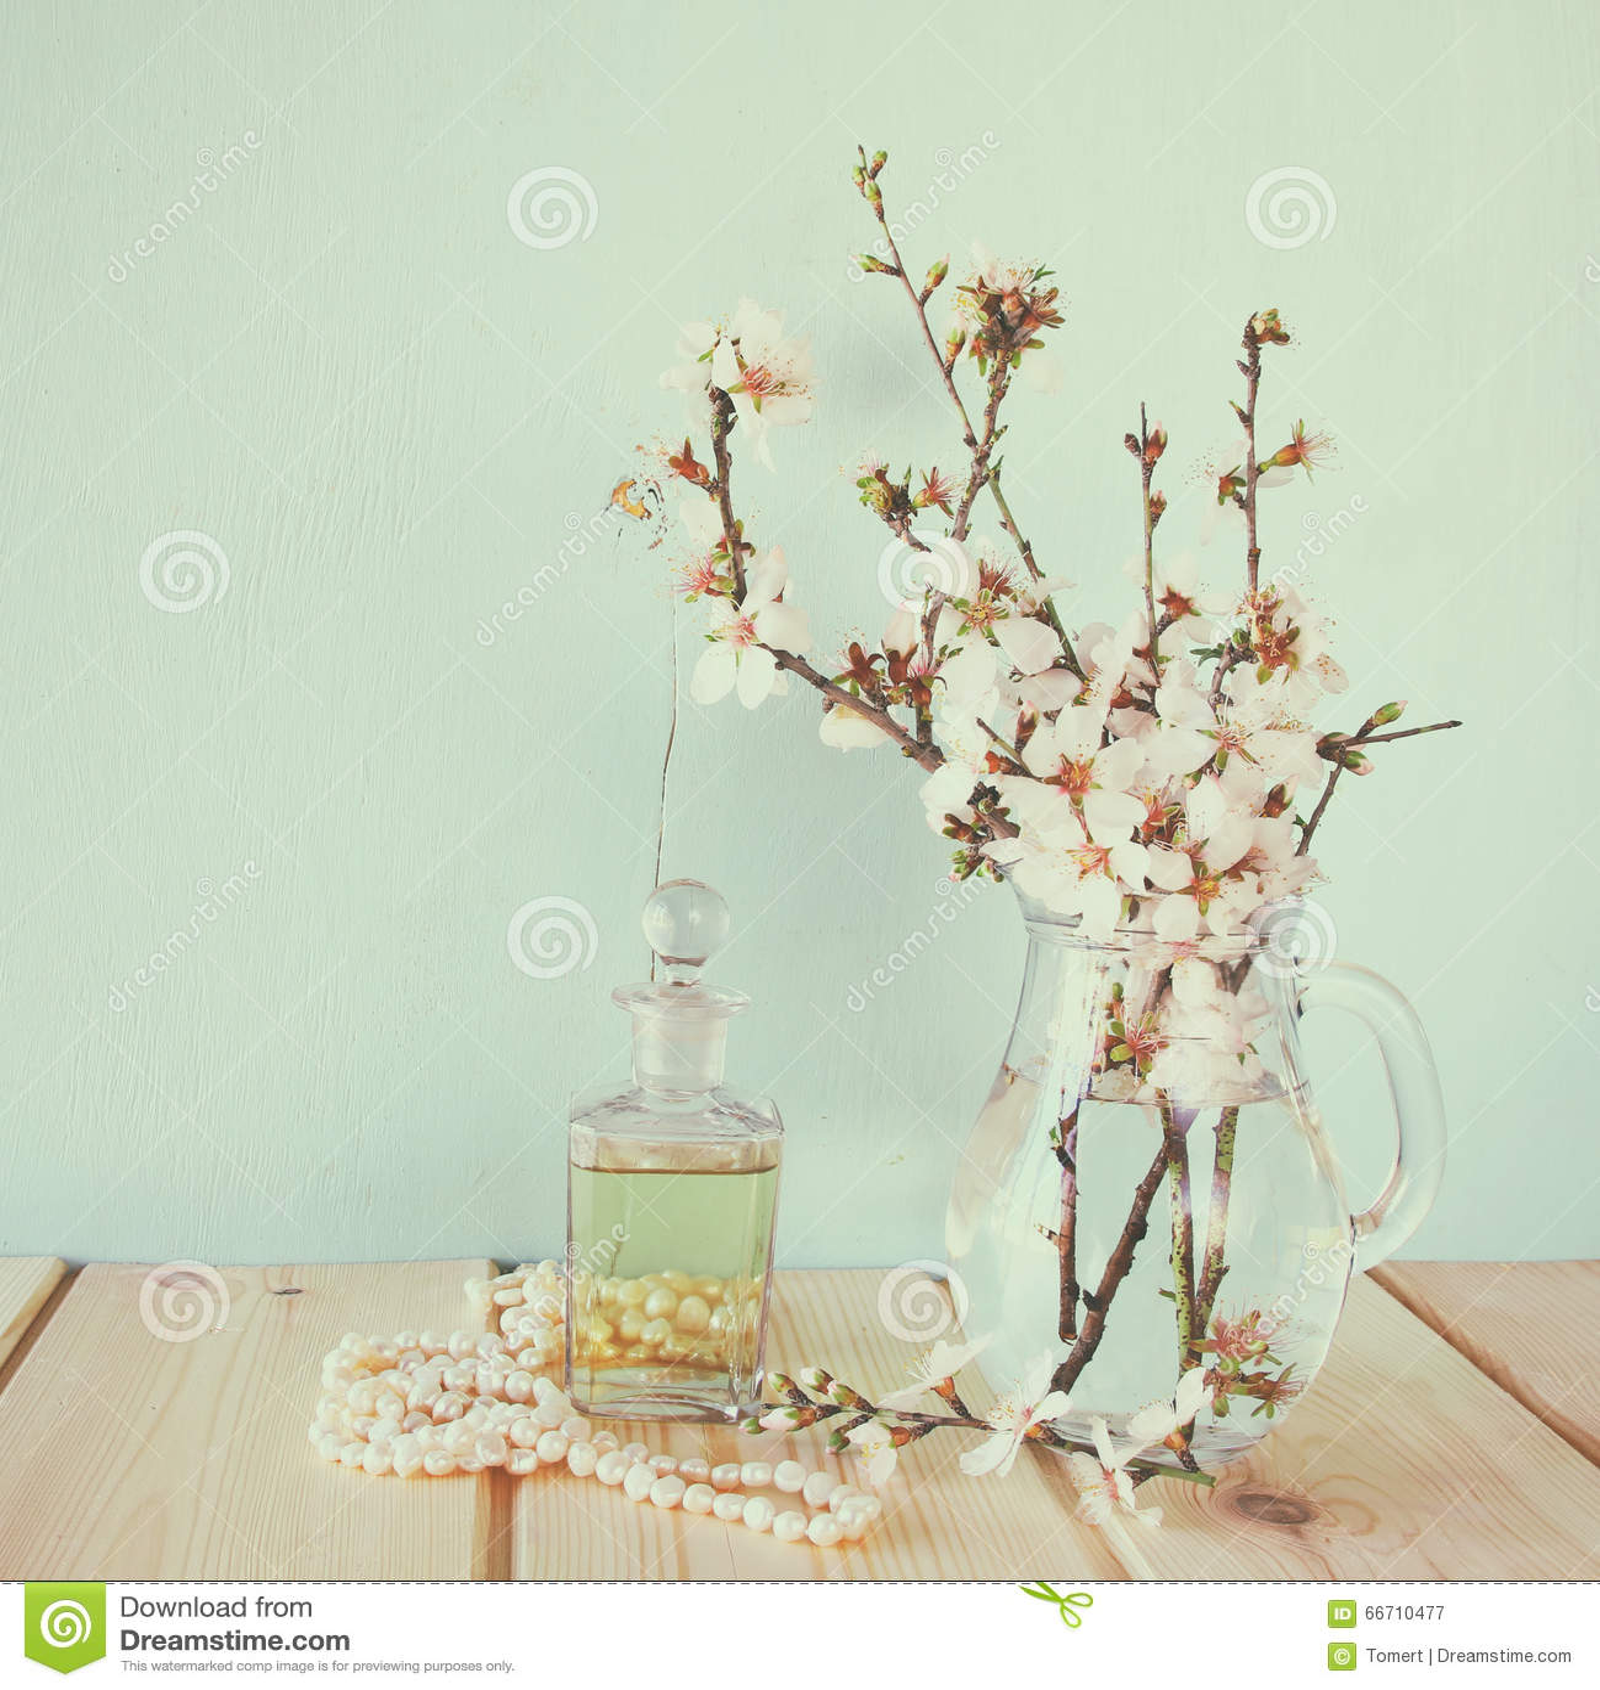 Fresh vintage perfume bottle next to white spring flowers on wooden download fresh vintage perfume bottle next to white spring flowers on wooden table vintage filtered mightylinksfo